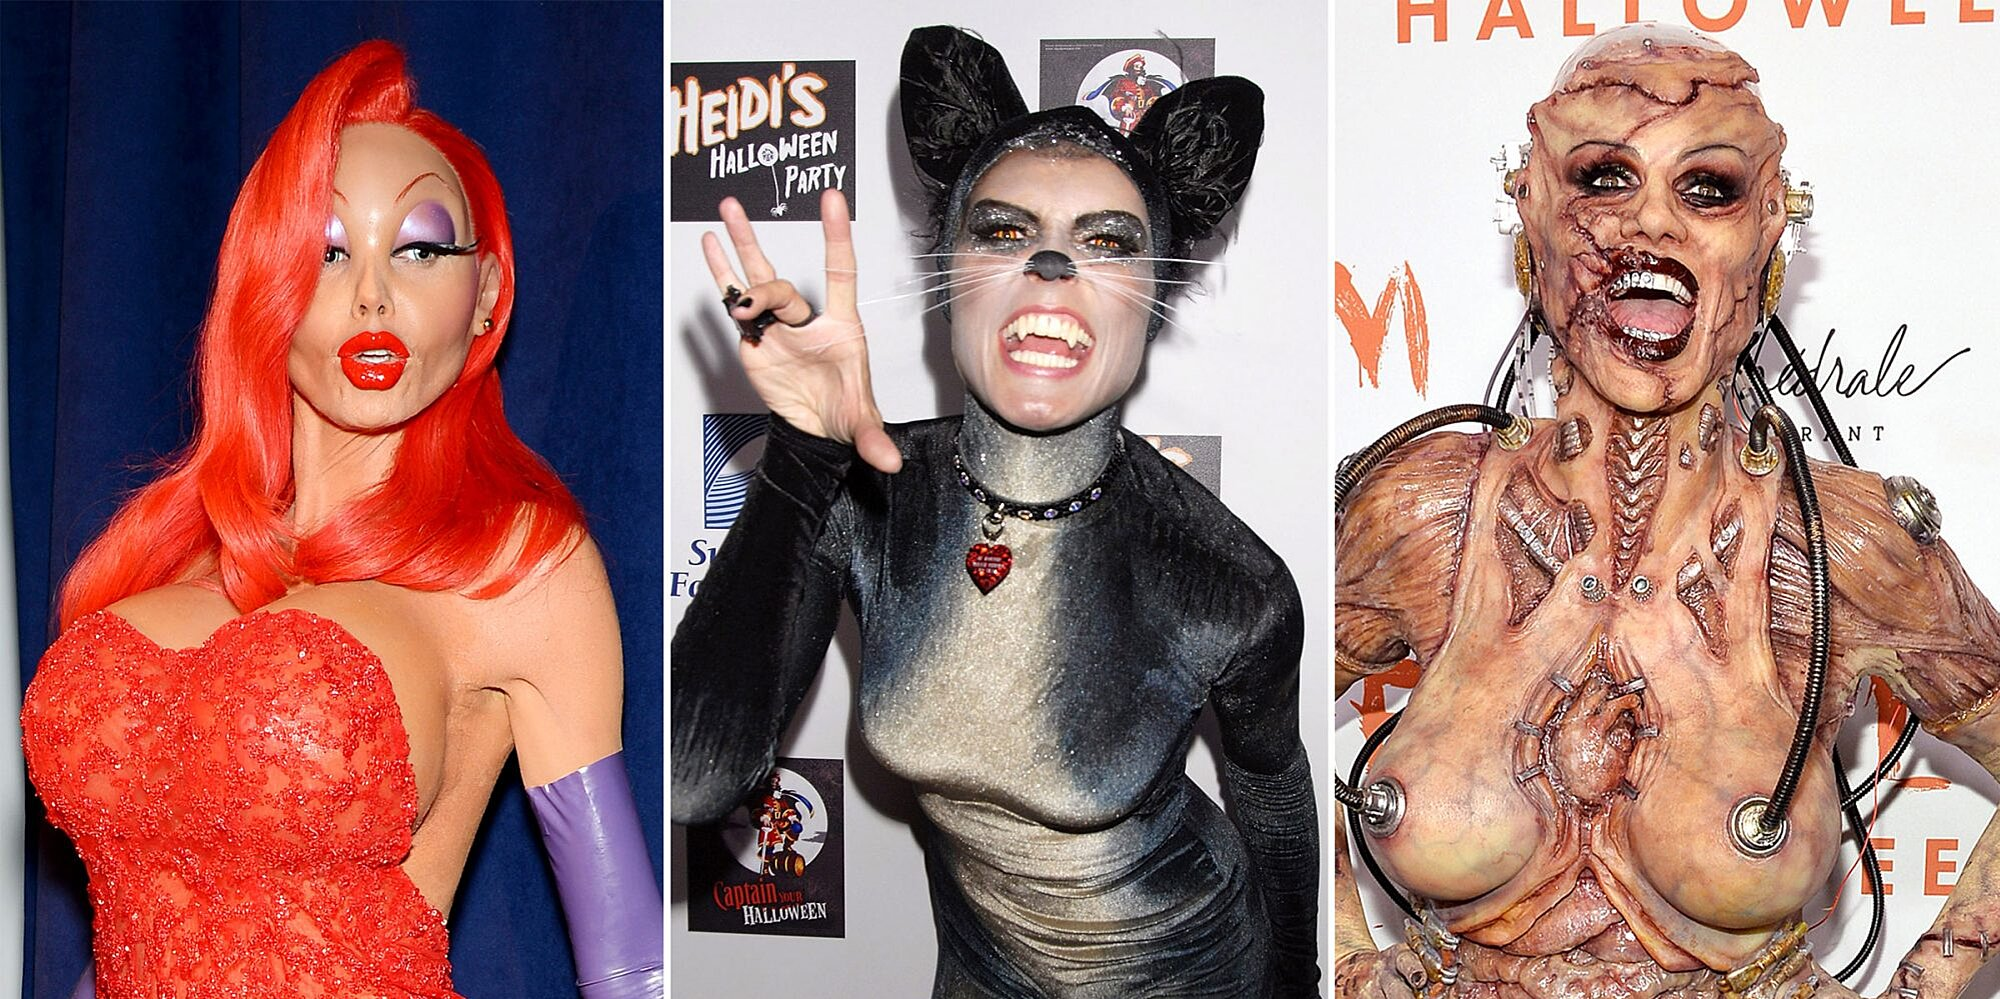 Heidi Klum Monkey Halloween Costume.Heidi Klum S Most Epic Halloween Costumes Ew Com